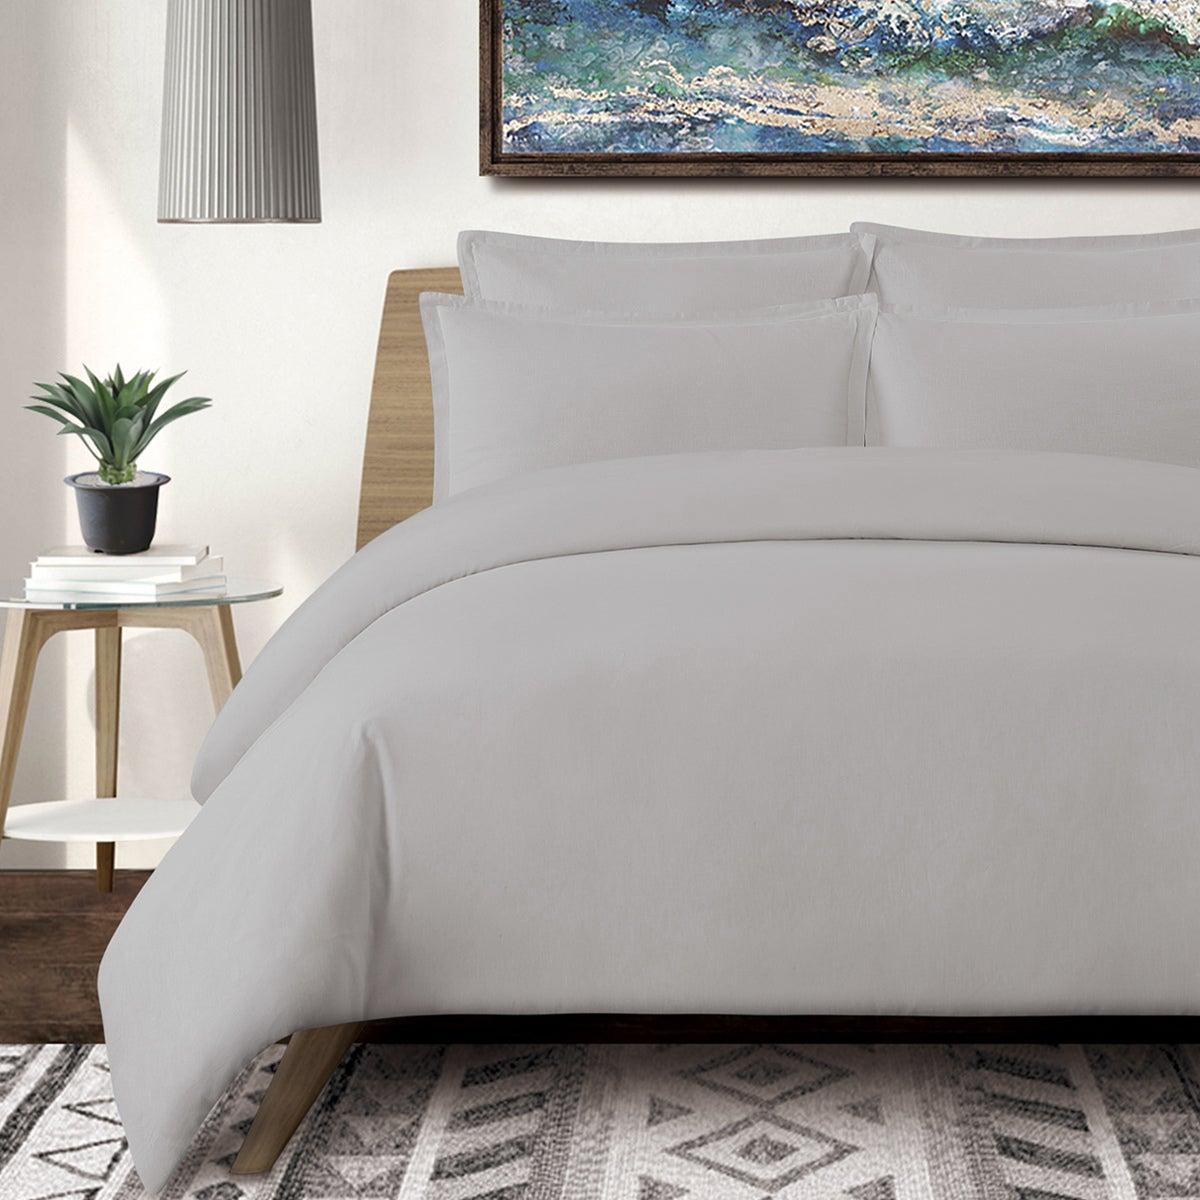 Washed Linen Cotton Blend Duvet Cover Set